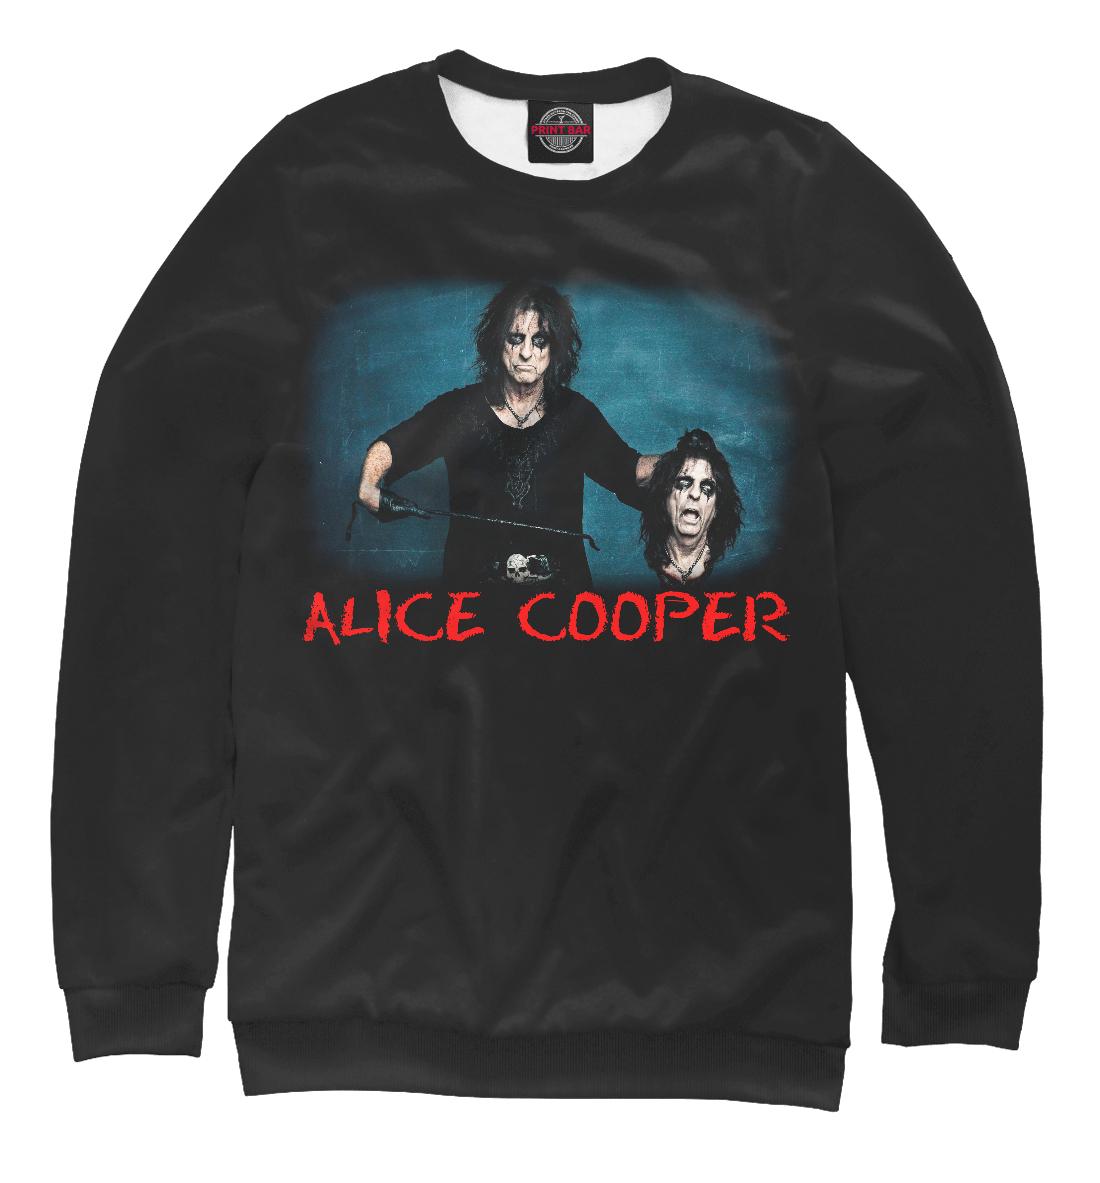 Купить Элис Купер - heavy metal, Printbar, Свитшоты, MZK-811773-swi-2